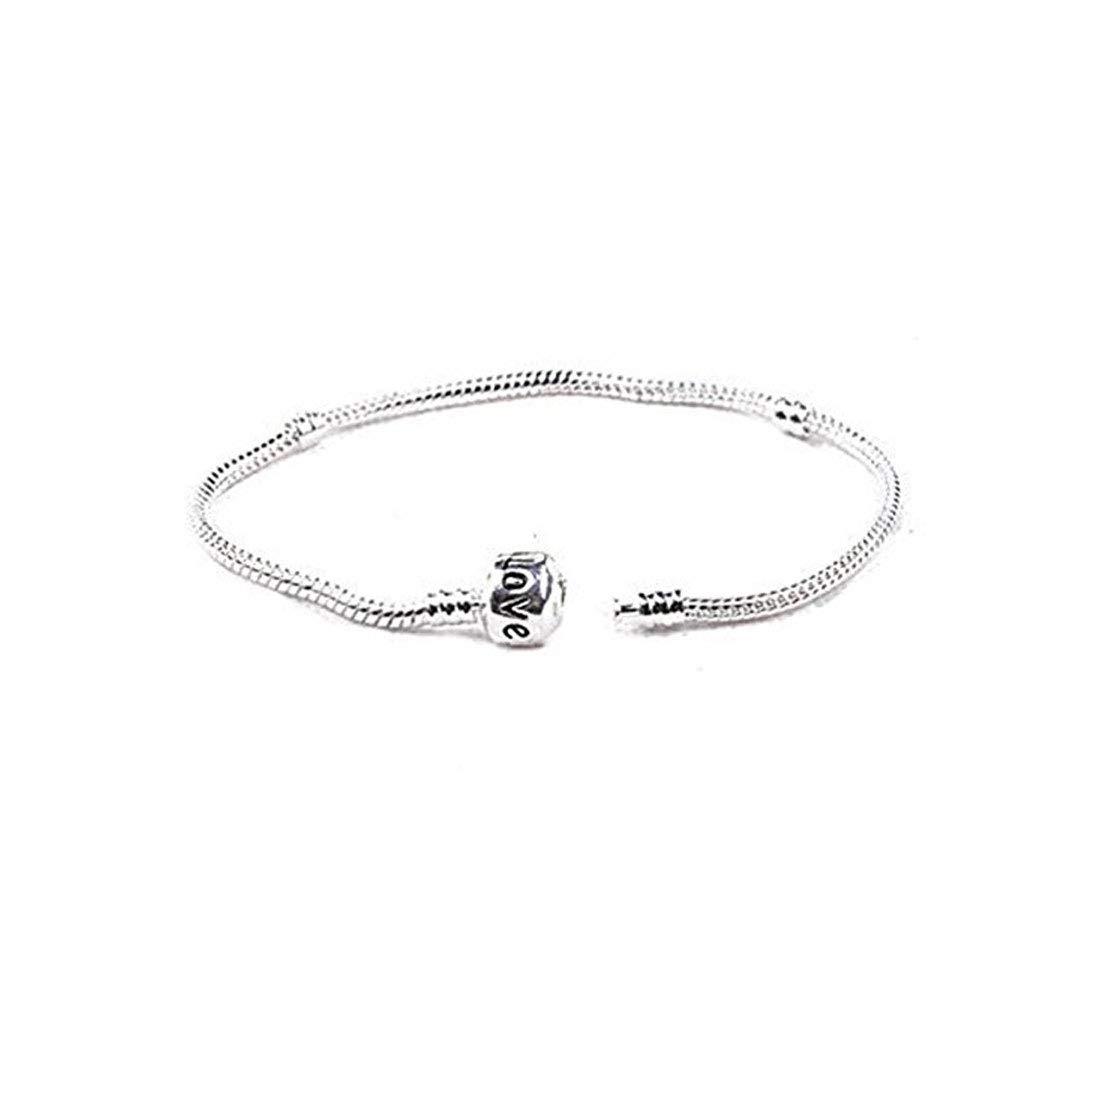 925 Silver Snake Charm Bracelet With Snap Clasp